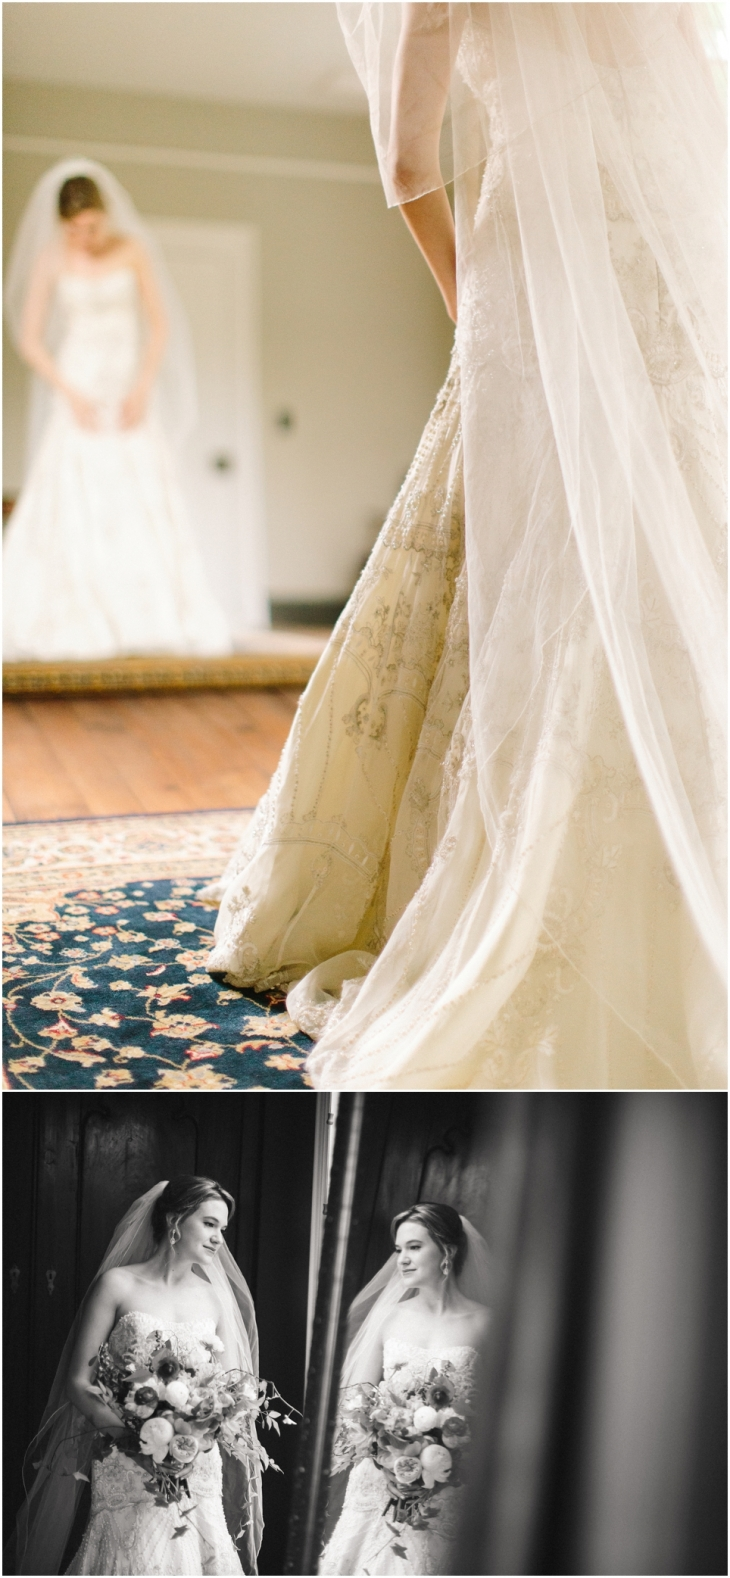 McLeod plantation brides